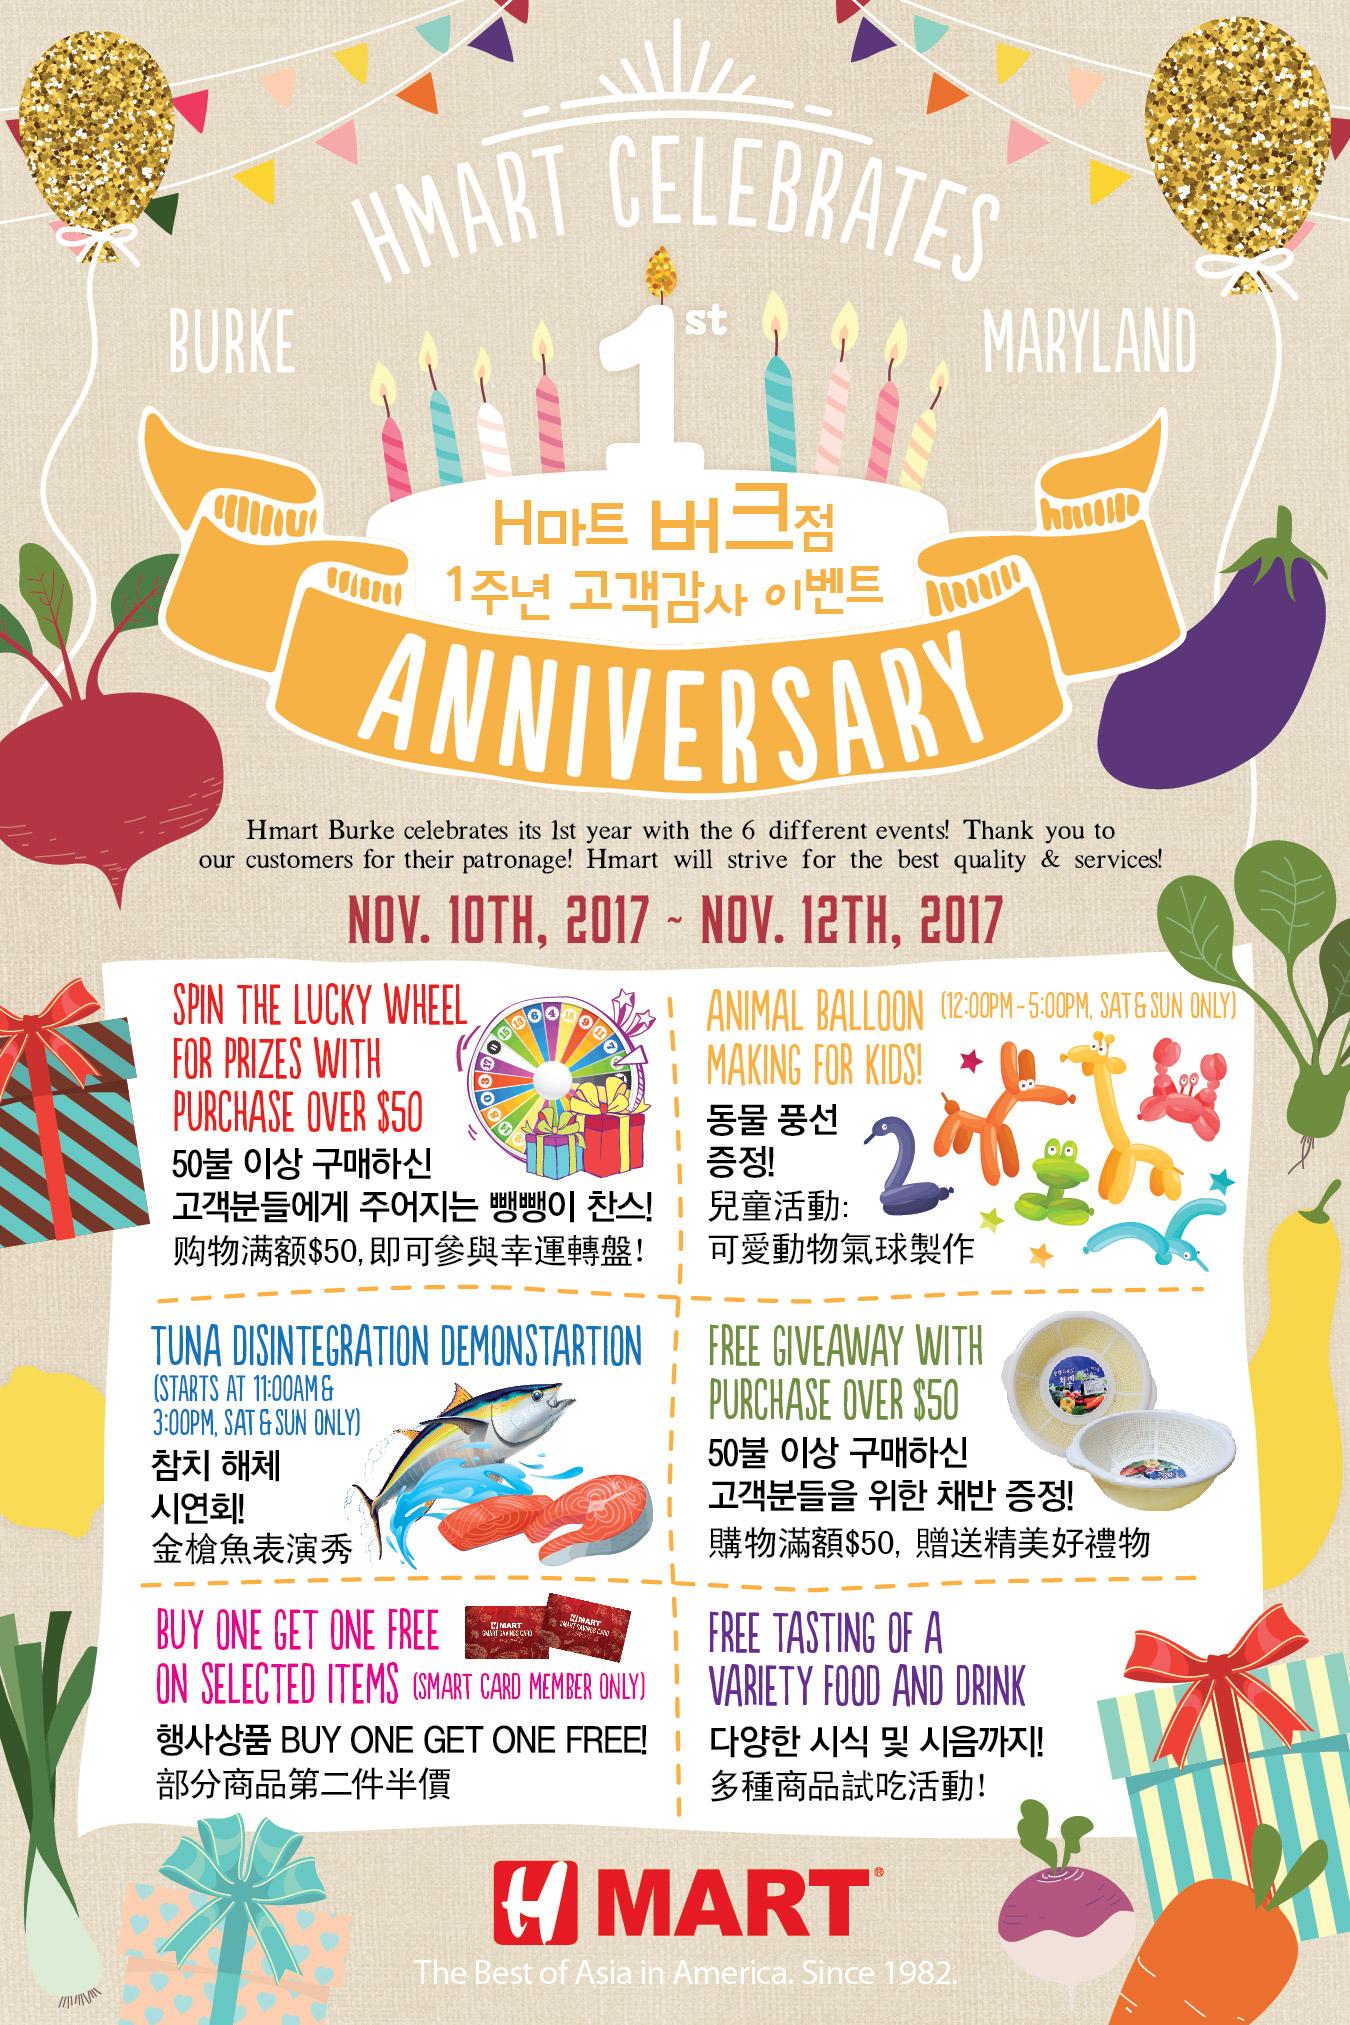 BRK_Hmart 1st Anniversary Poster_한중영-02 (1)